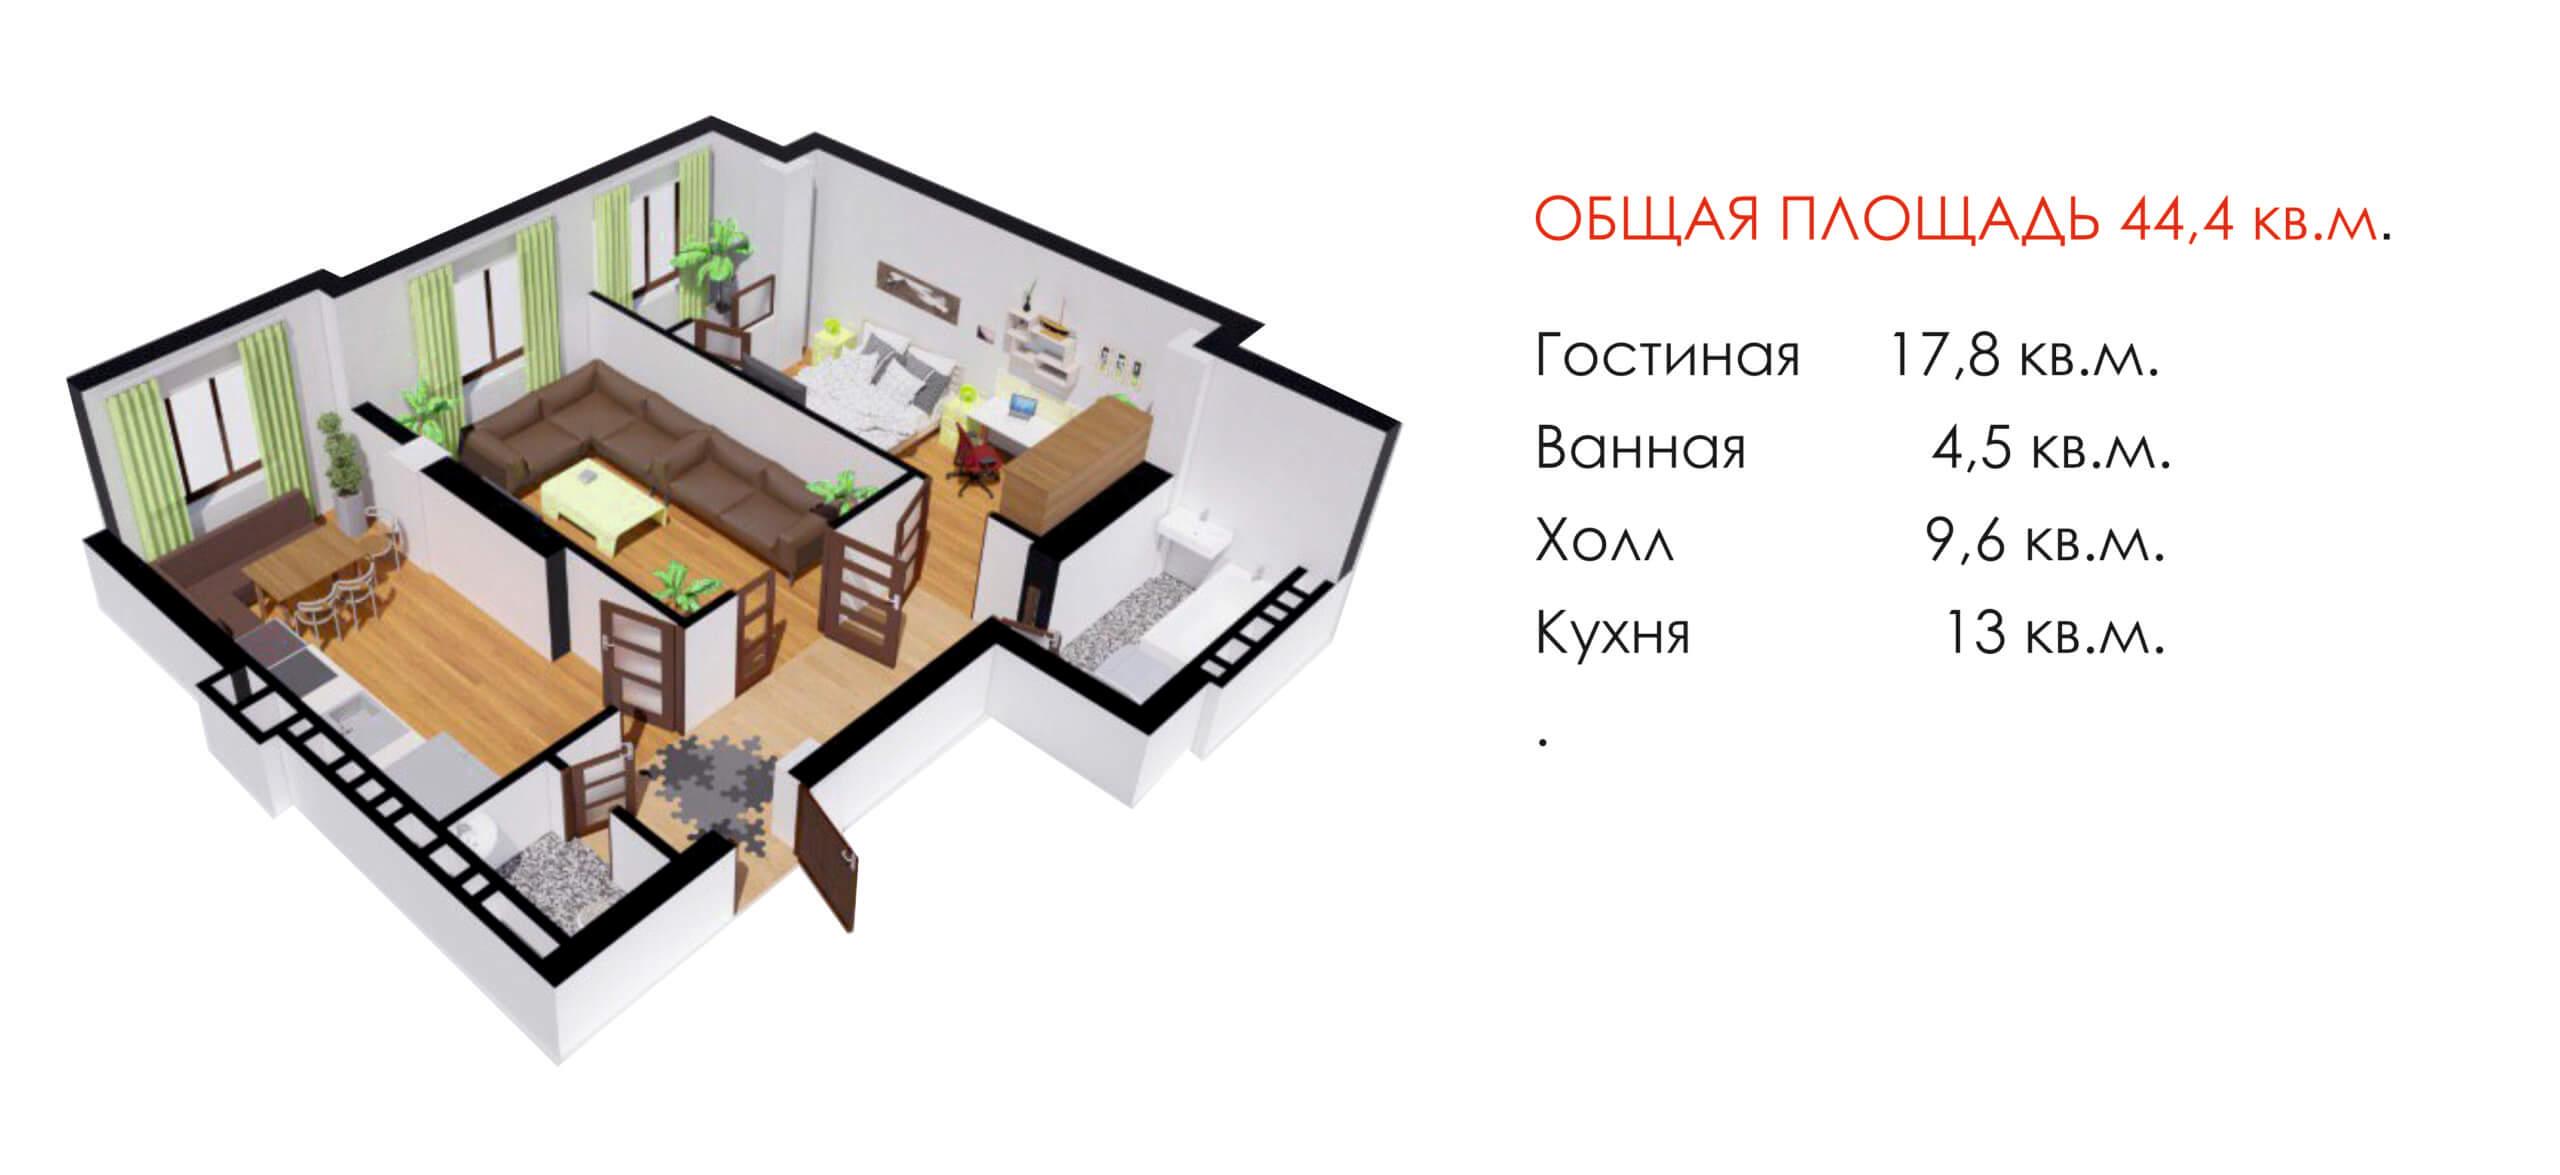 Однокомнатная квартира 44,4 кв.м.